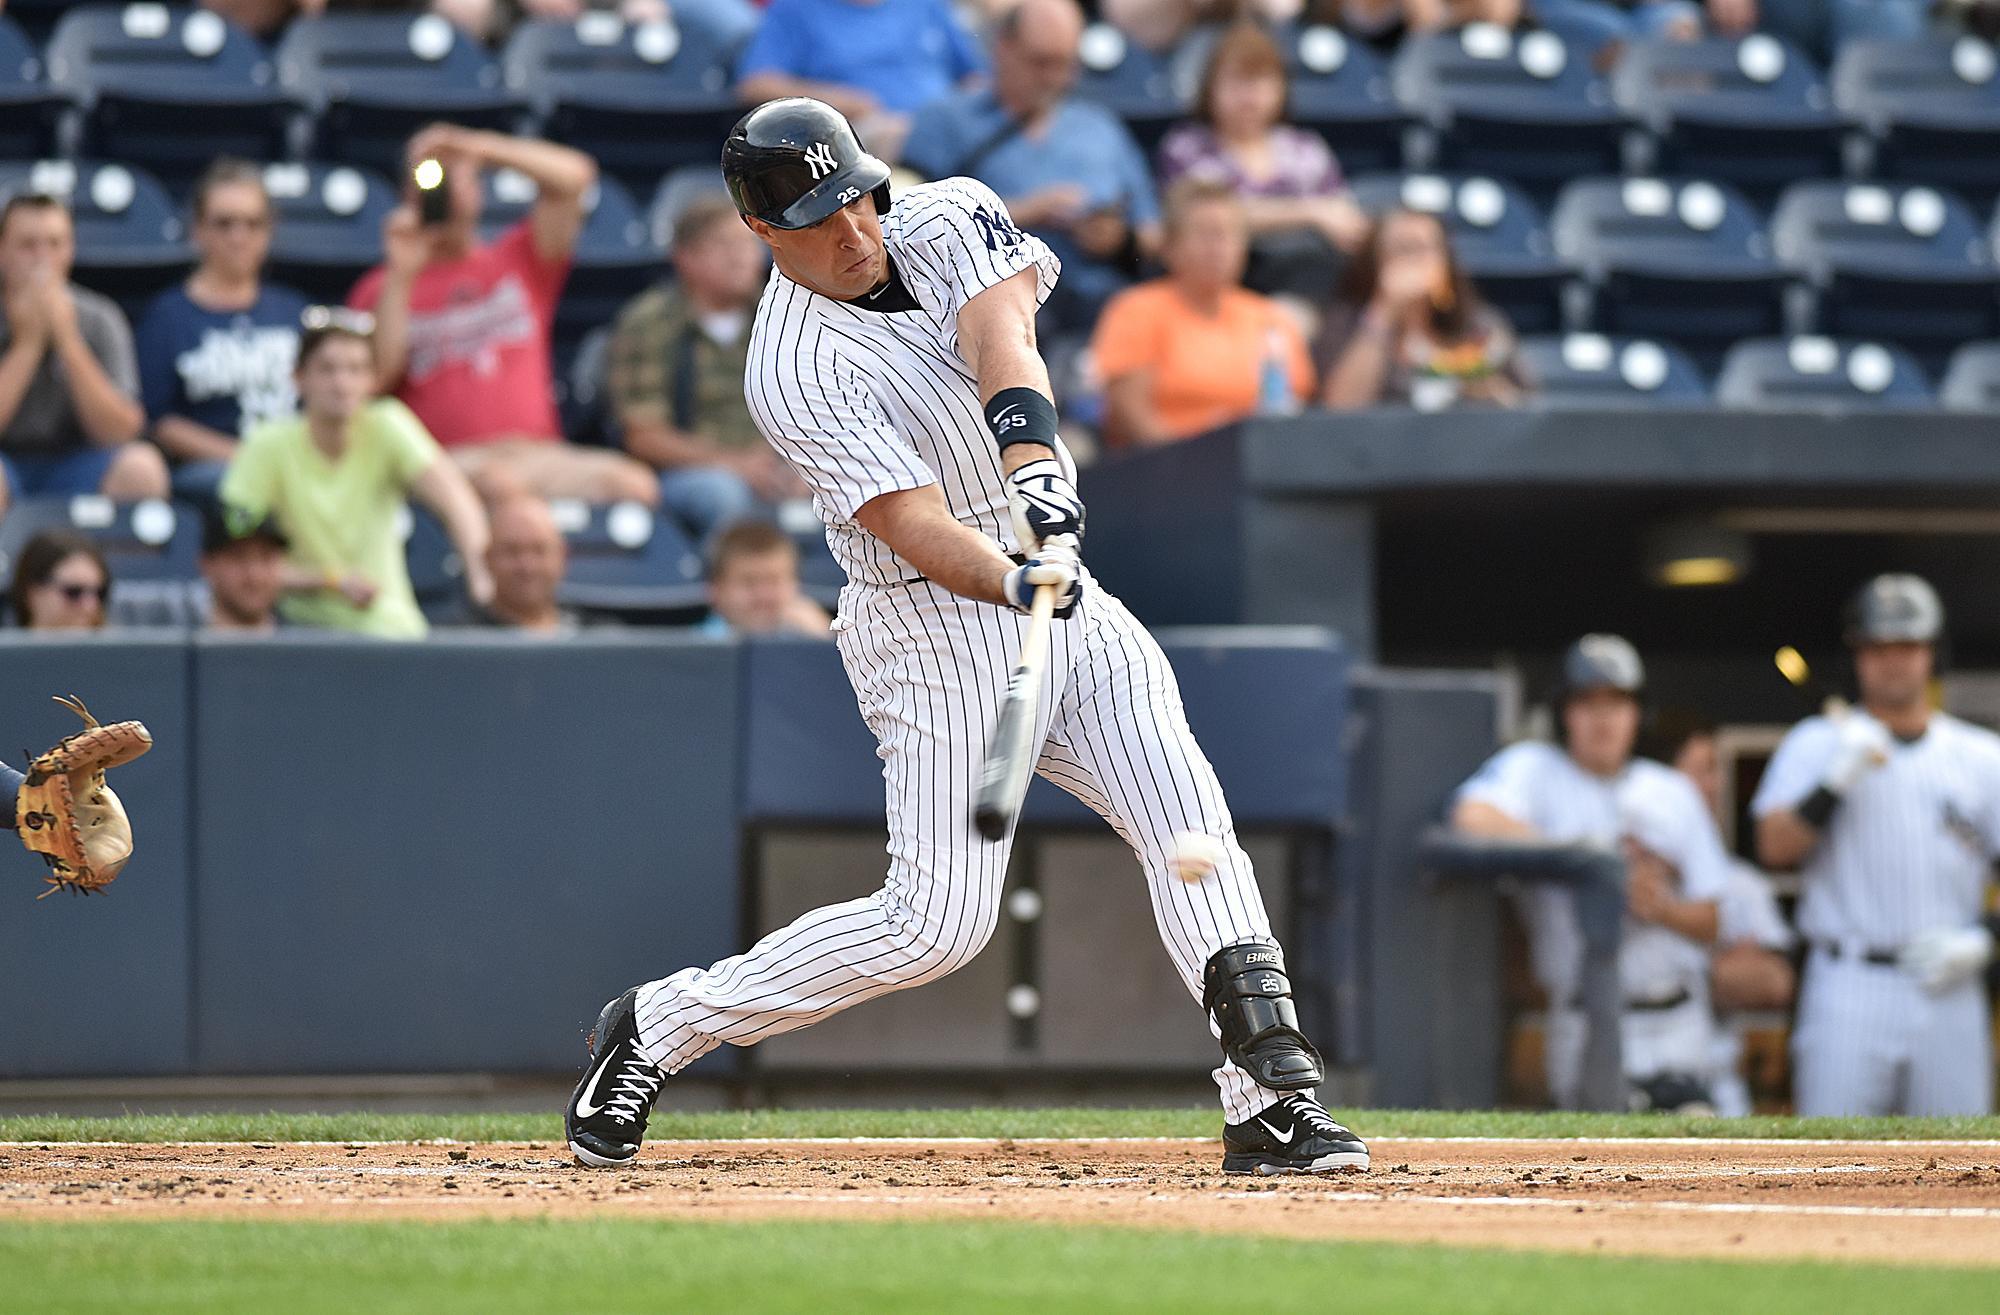 Yankees_teixeira_baseball